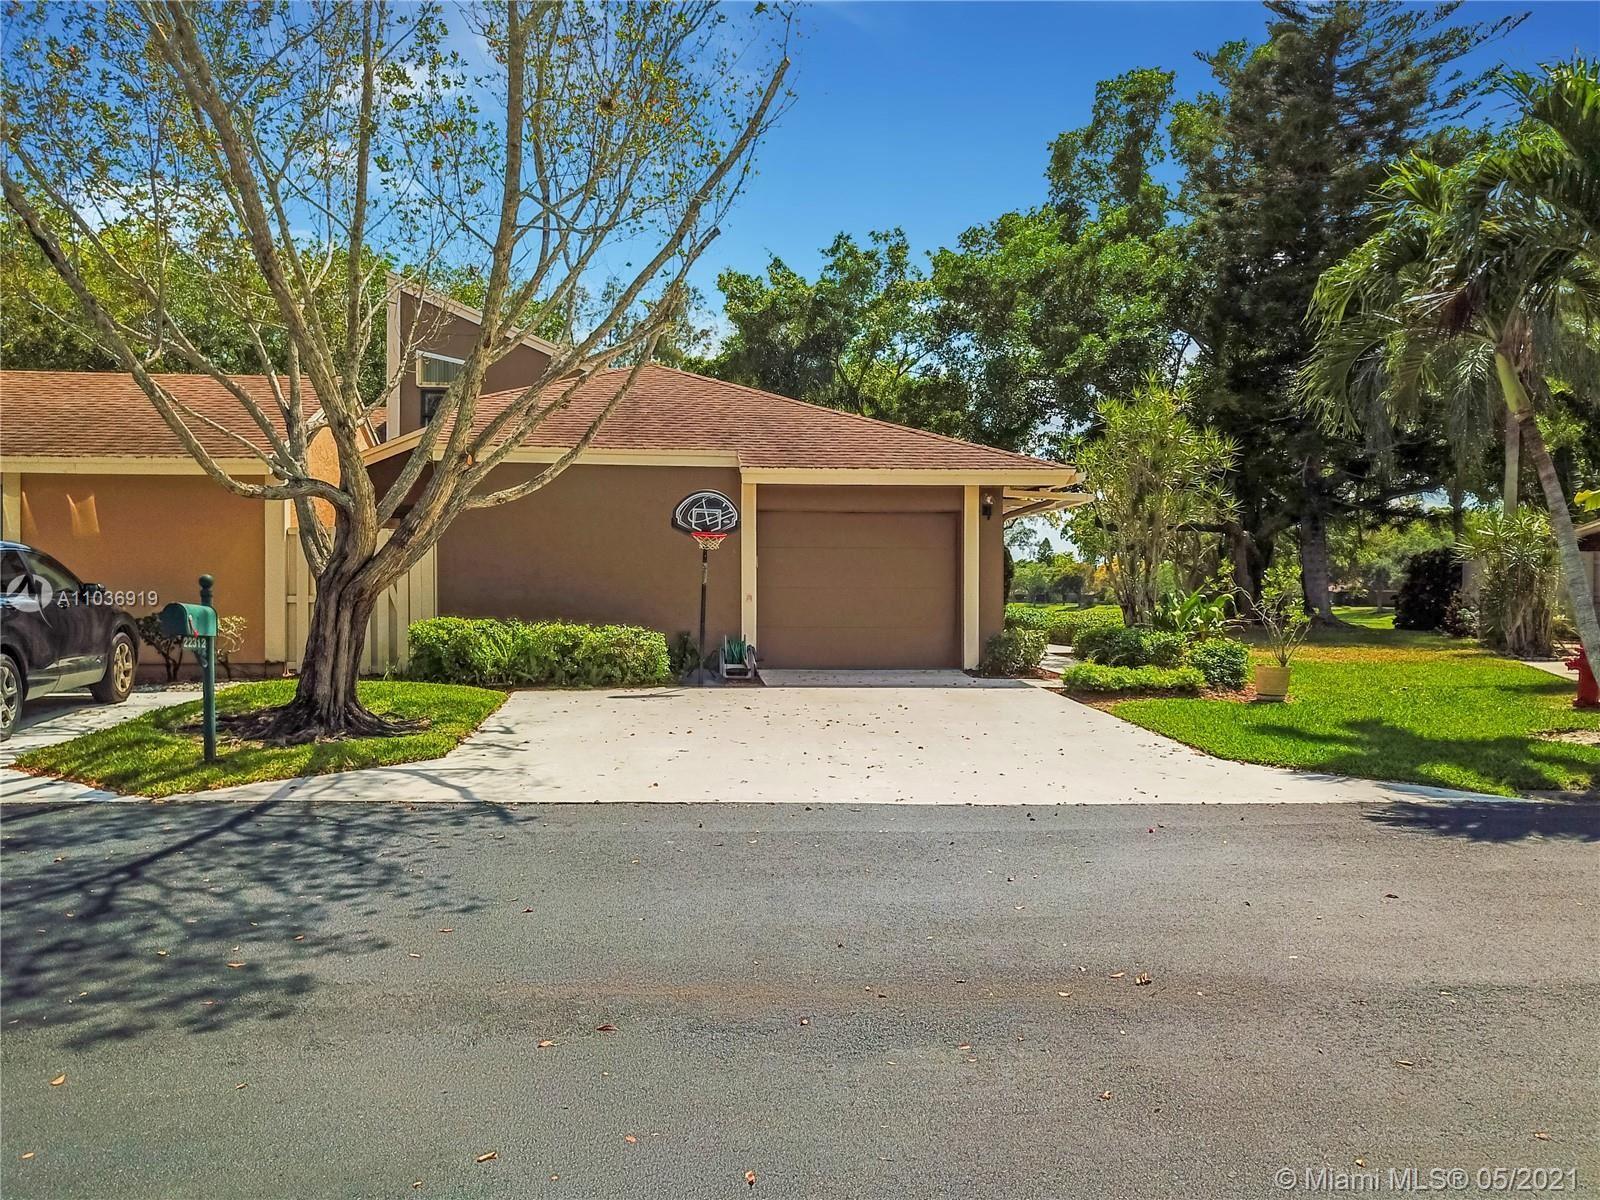 22312 Whistling Pines Ln, Boca Raton, FL 33428 - #: A11036919